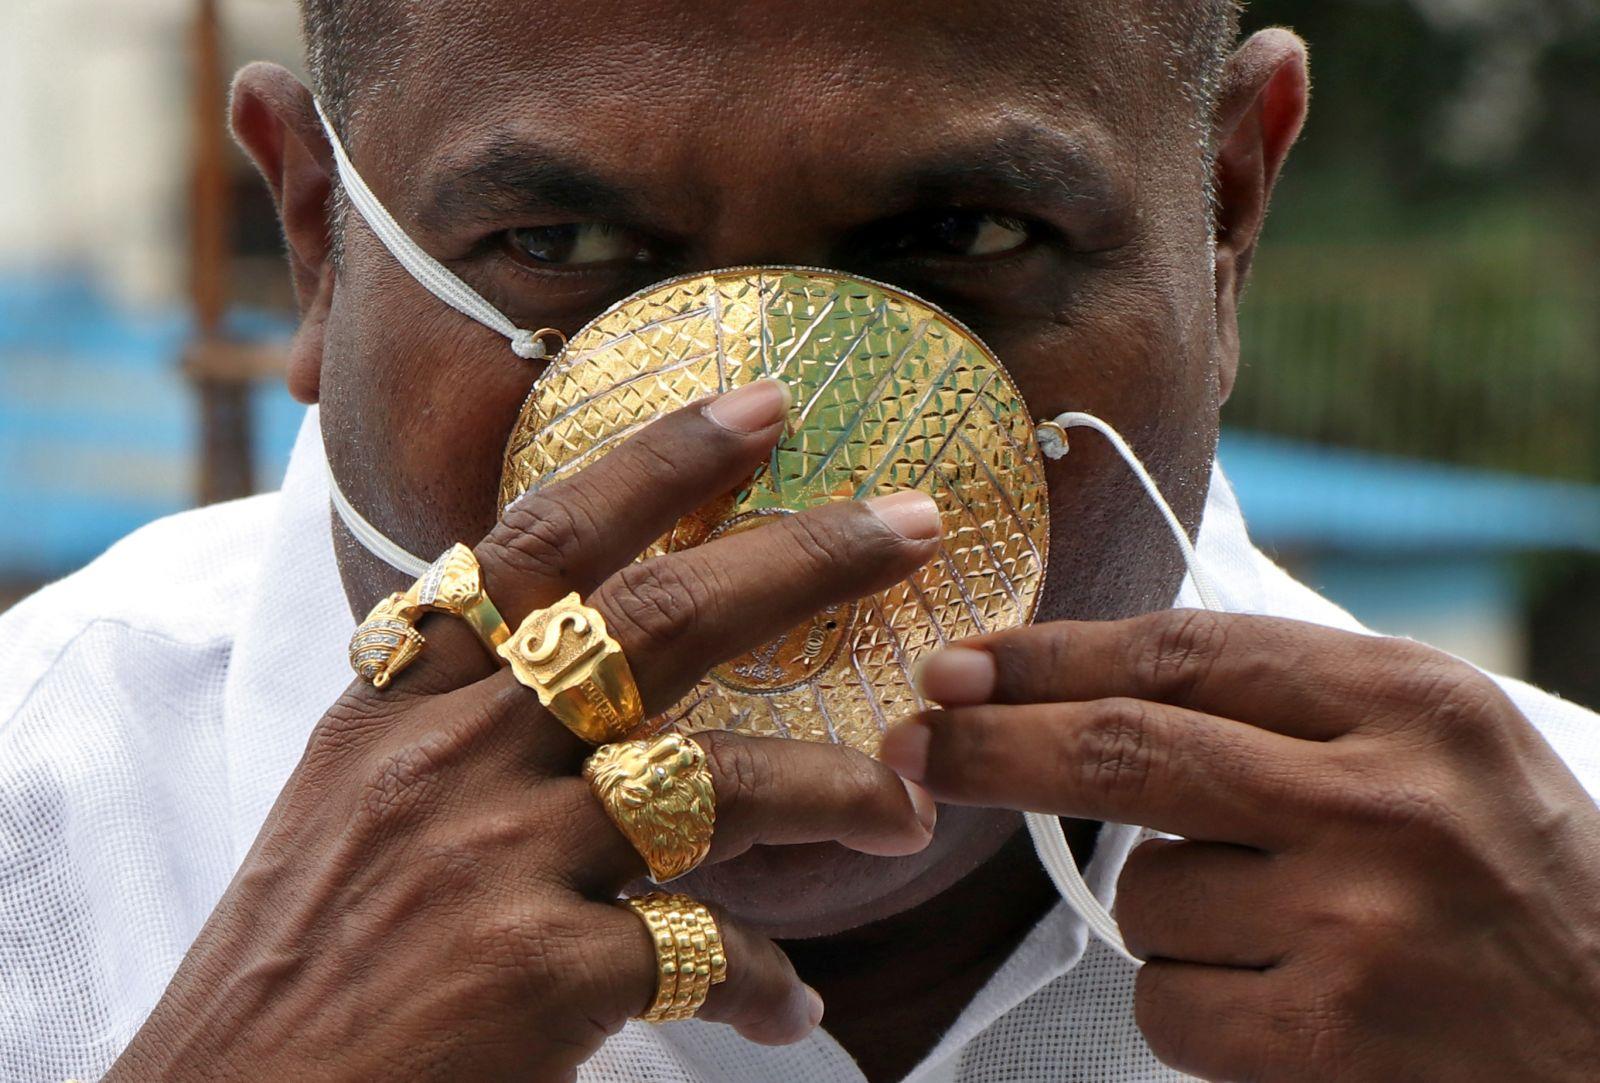 златна маска коронавирус